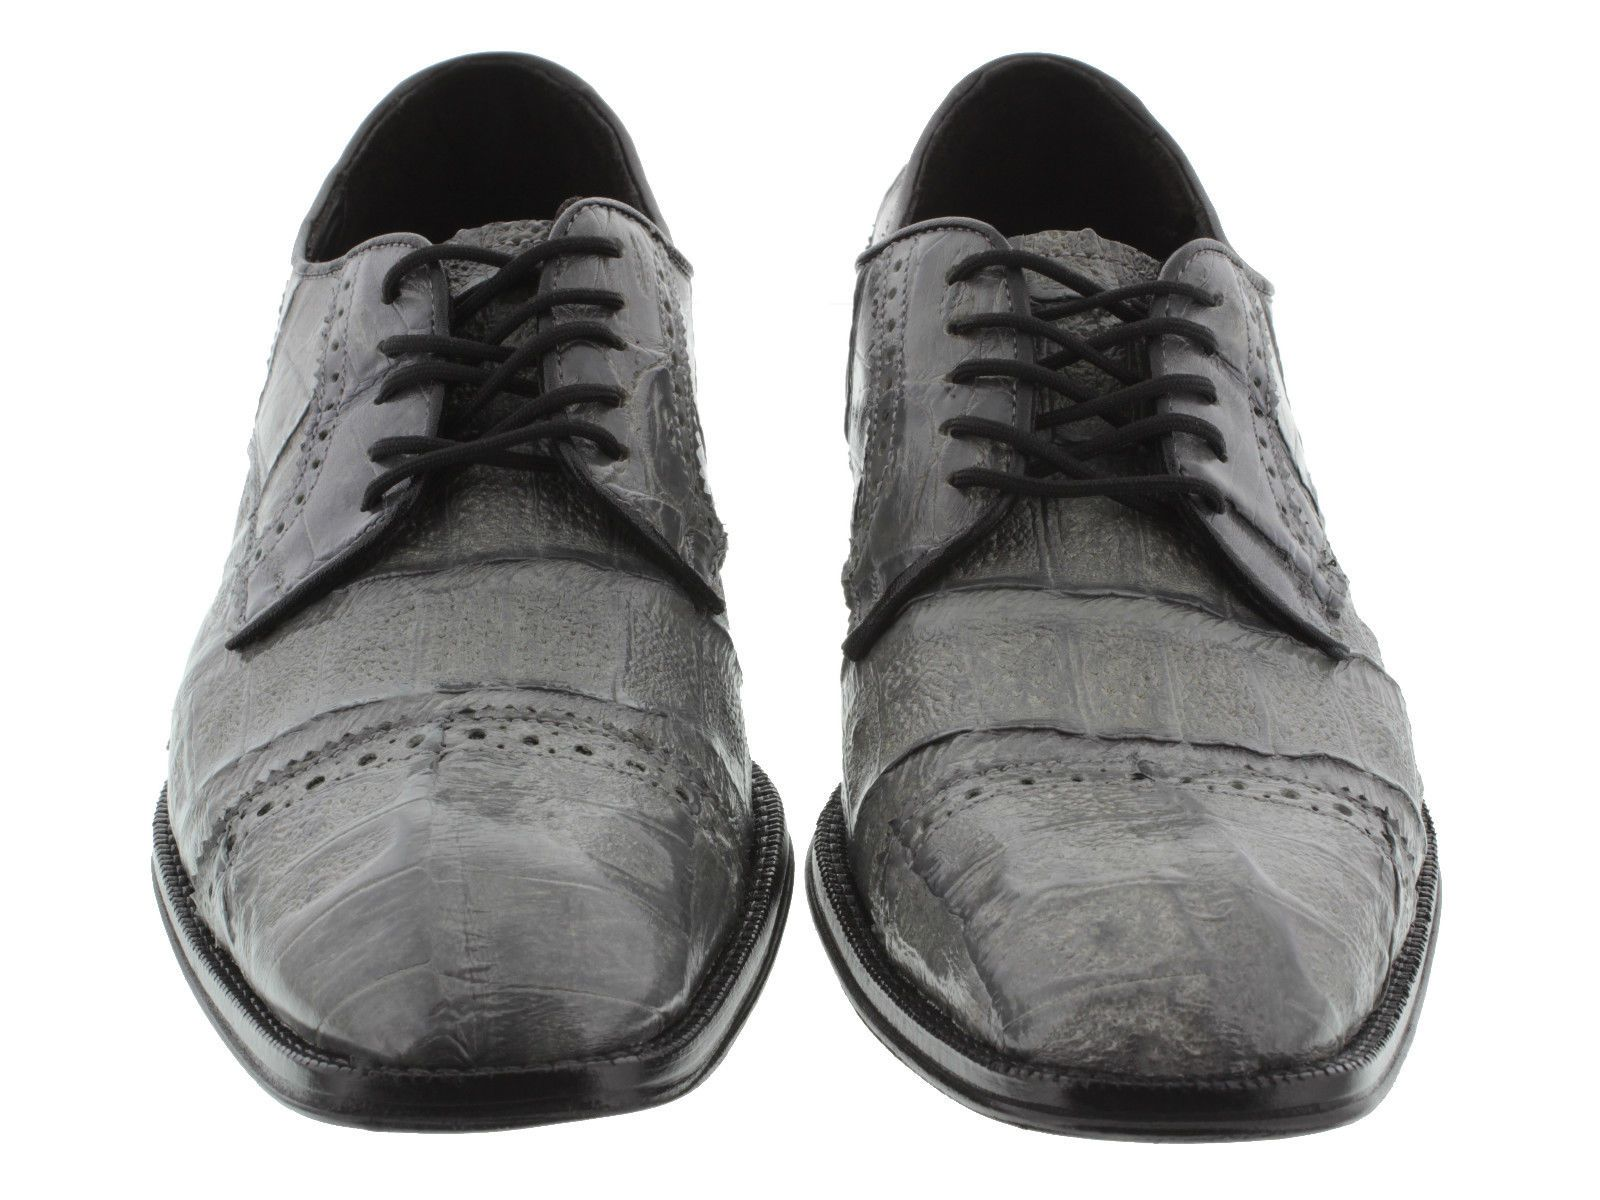 Men s dress shoes gray genuine crocodile alligator skin oxfords loafers  exotic e7ae445f692